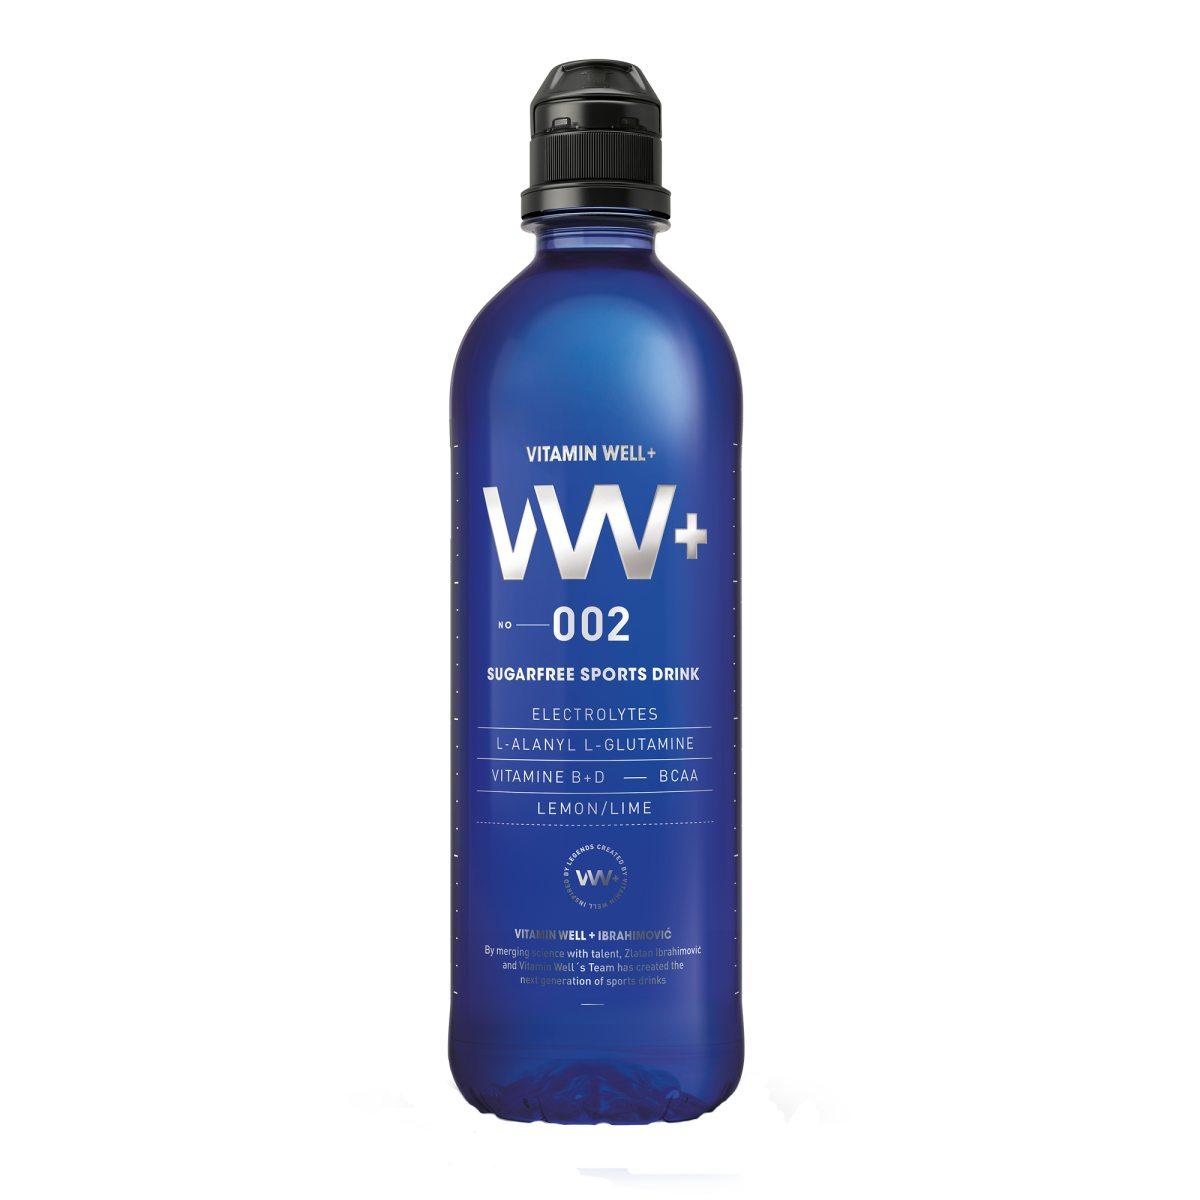 Vitamin well 001